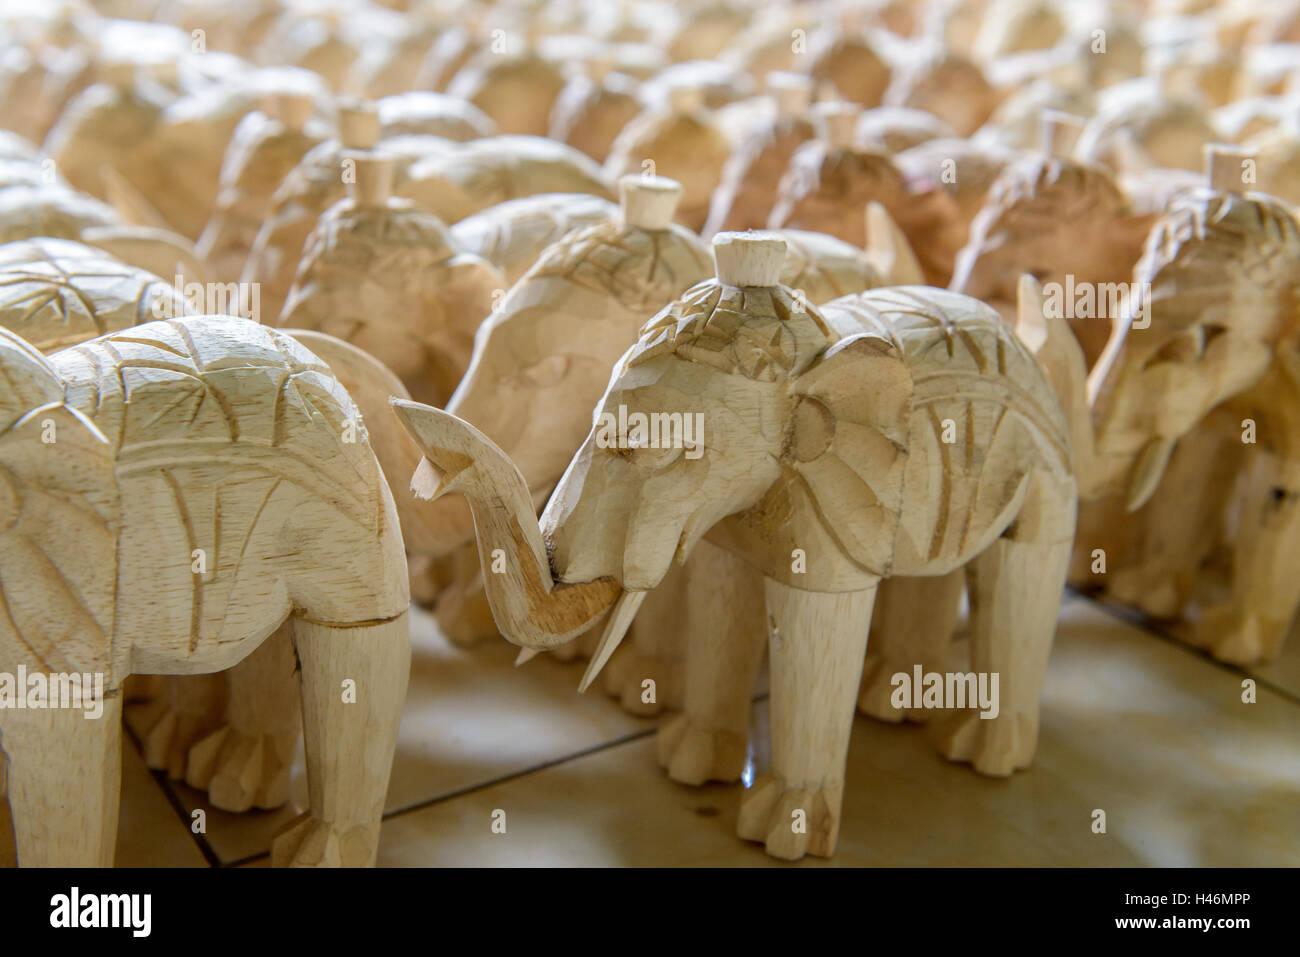 Wooden elephants   Holzelefanten - Stock Image